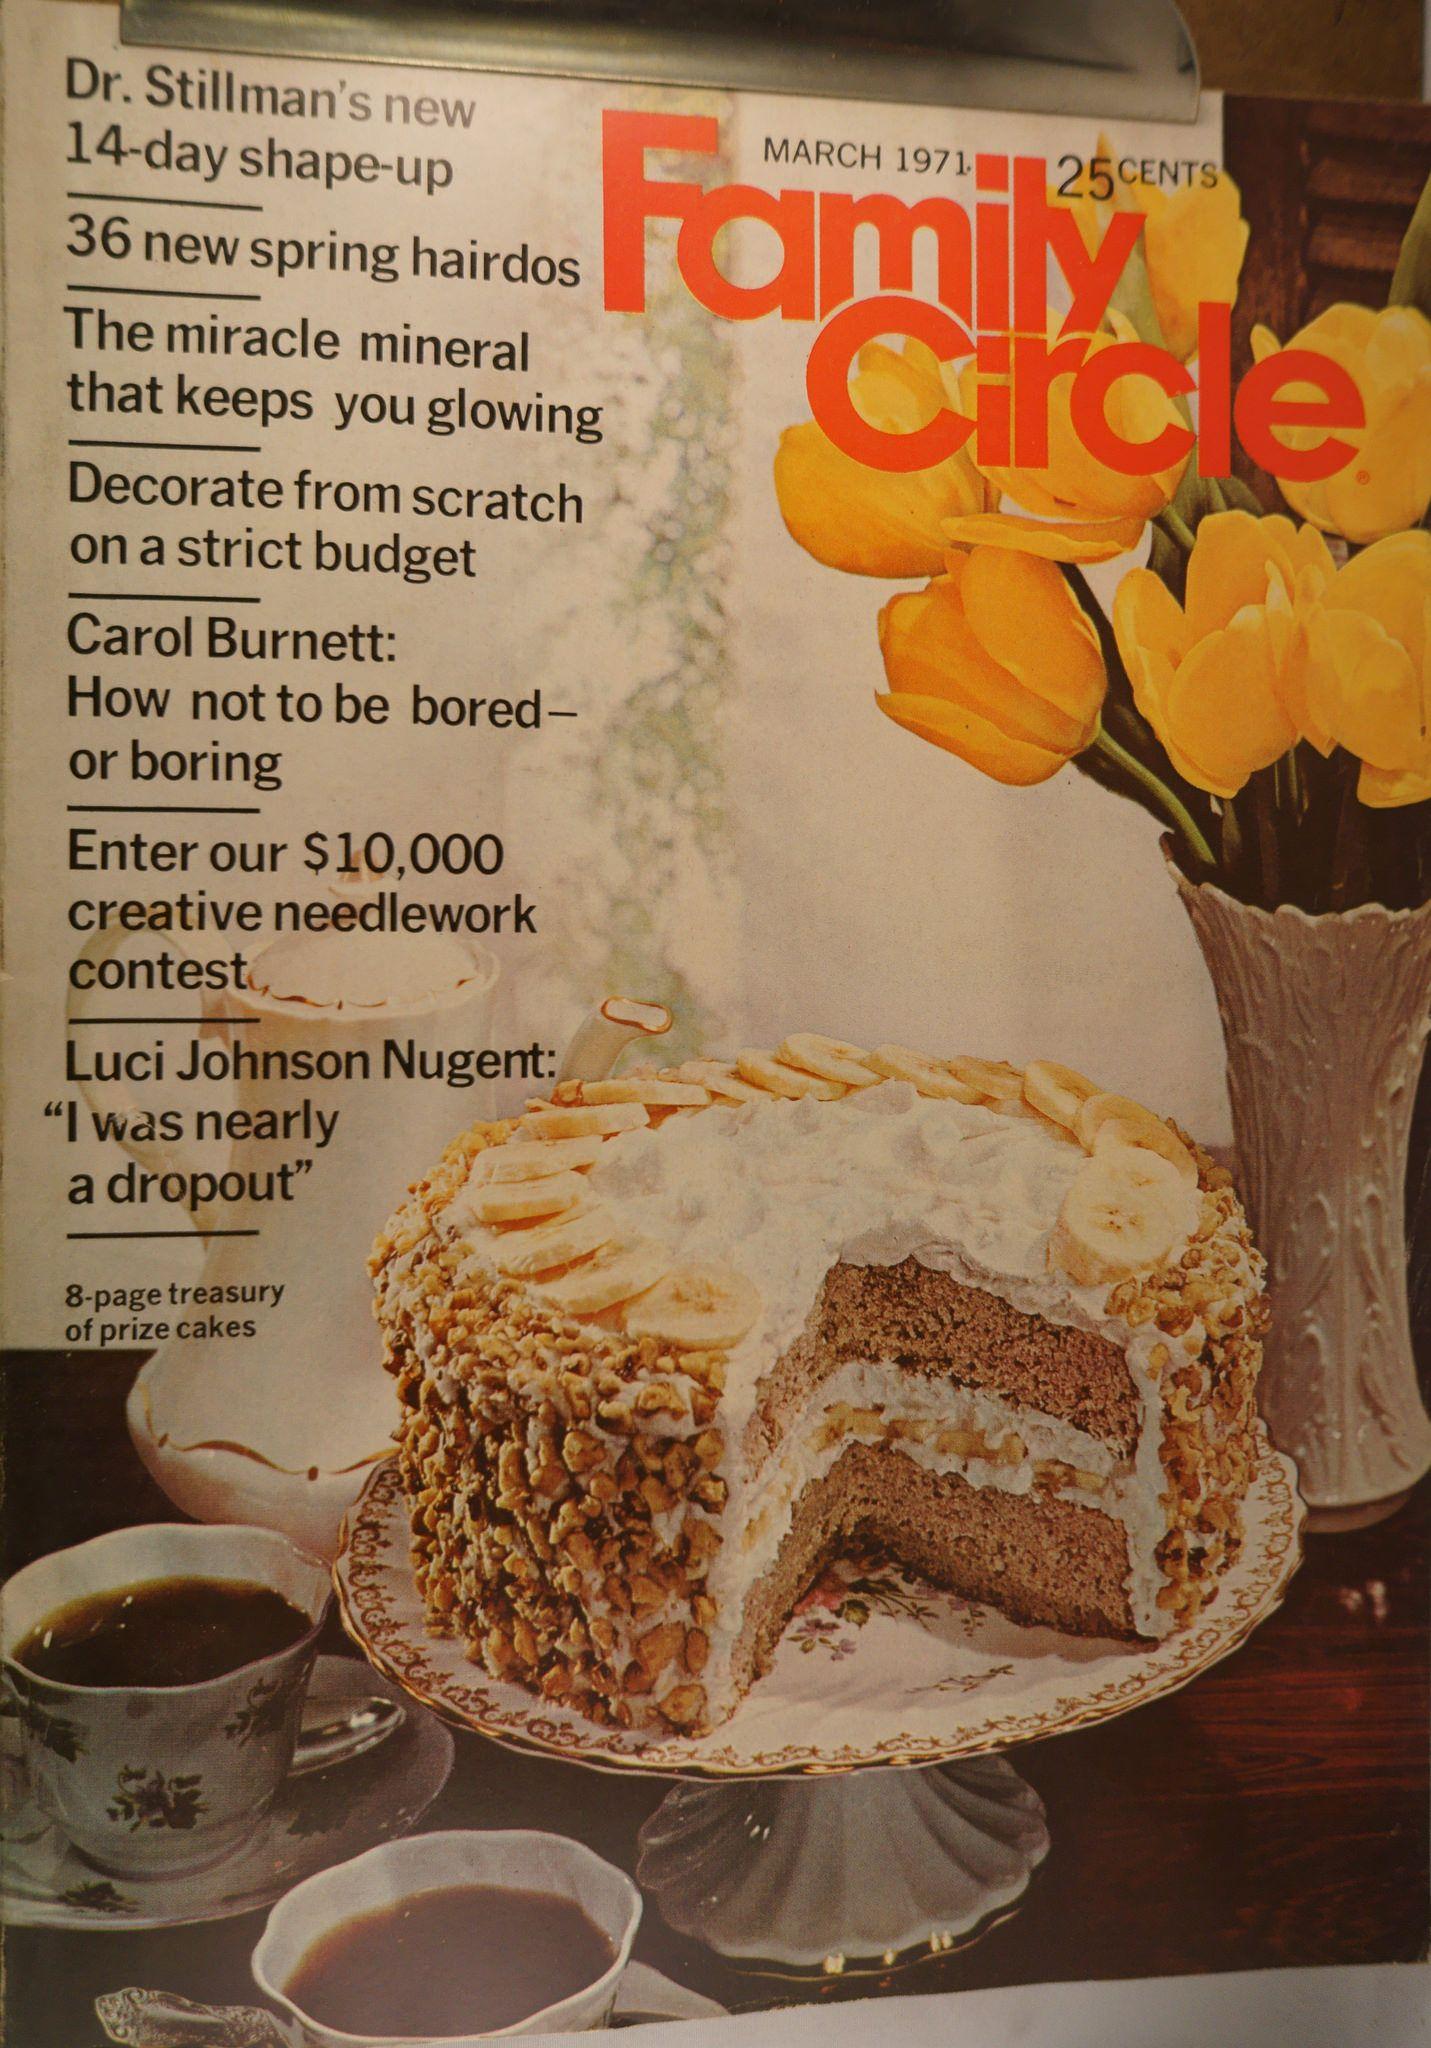 https://flic.kr/p/v4Hr3Y | Family Circle March 1971 | $6.00 each plus Shipping.